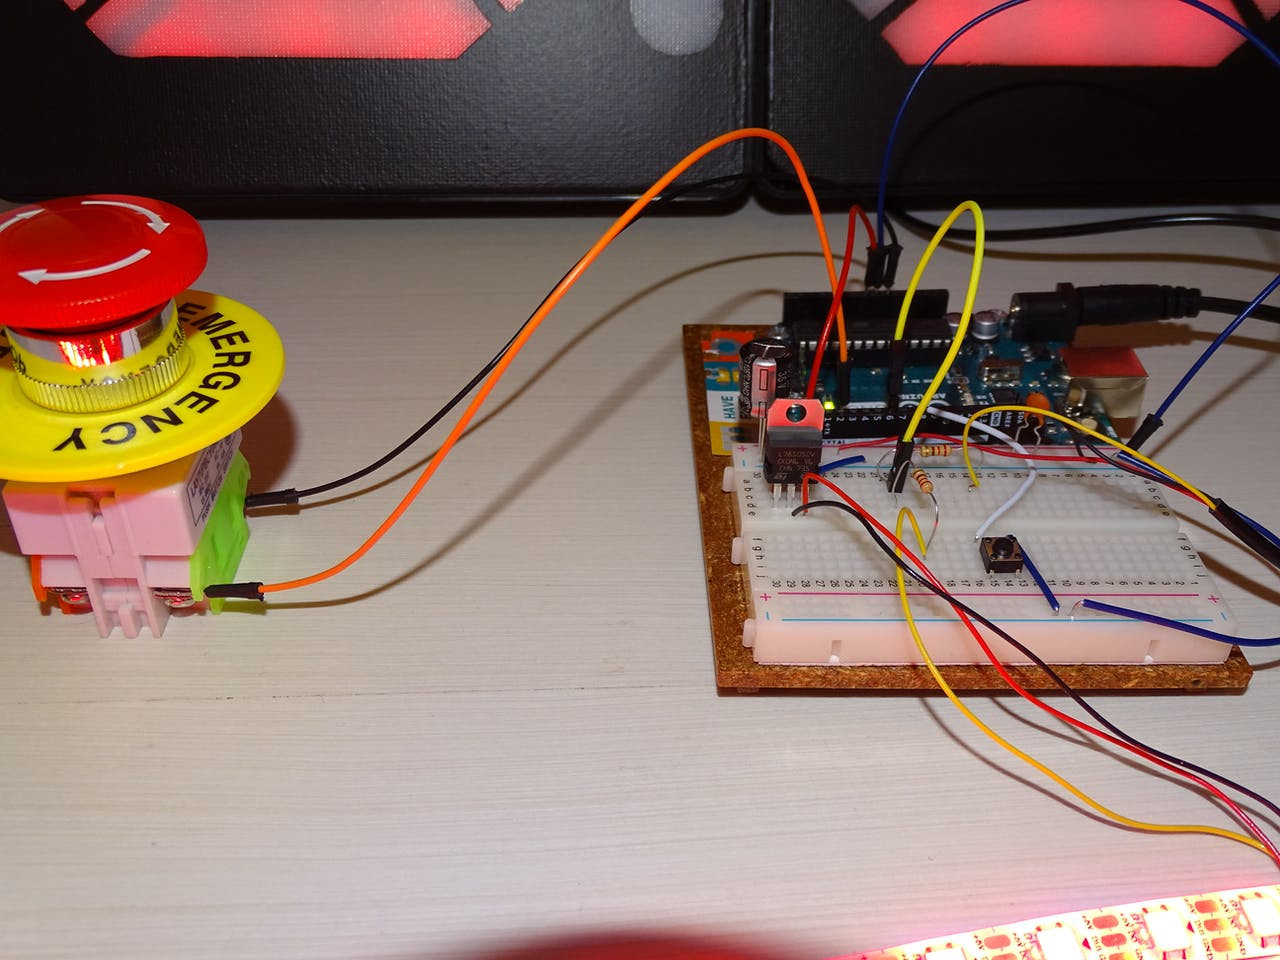 Arduino Bingo Machine With Diy A4 Size 7 Segment Displays Scoring Display Led Schematic Design